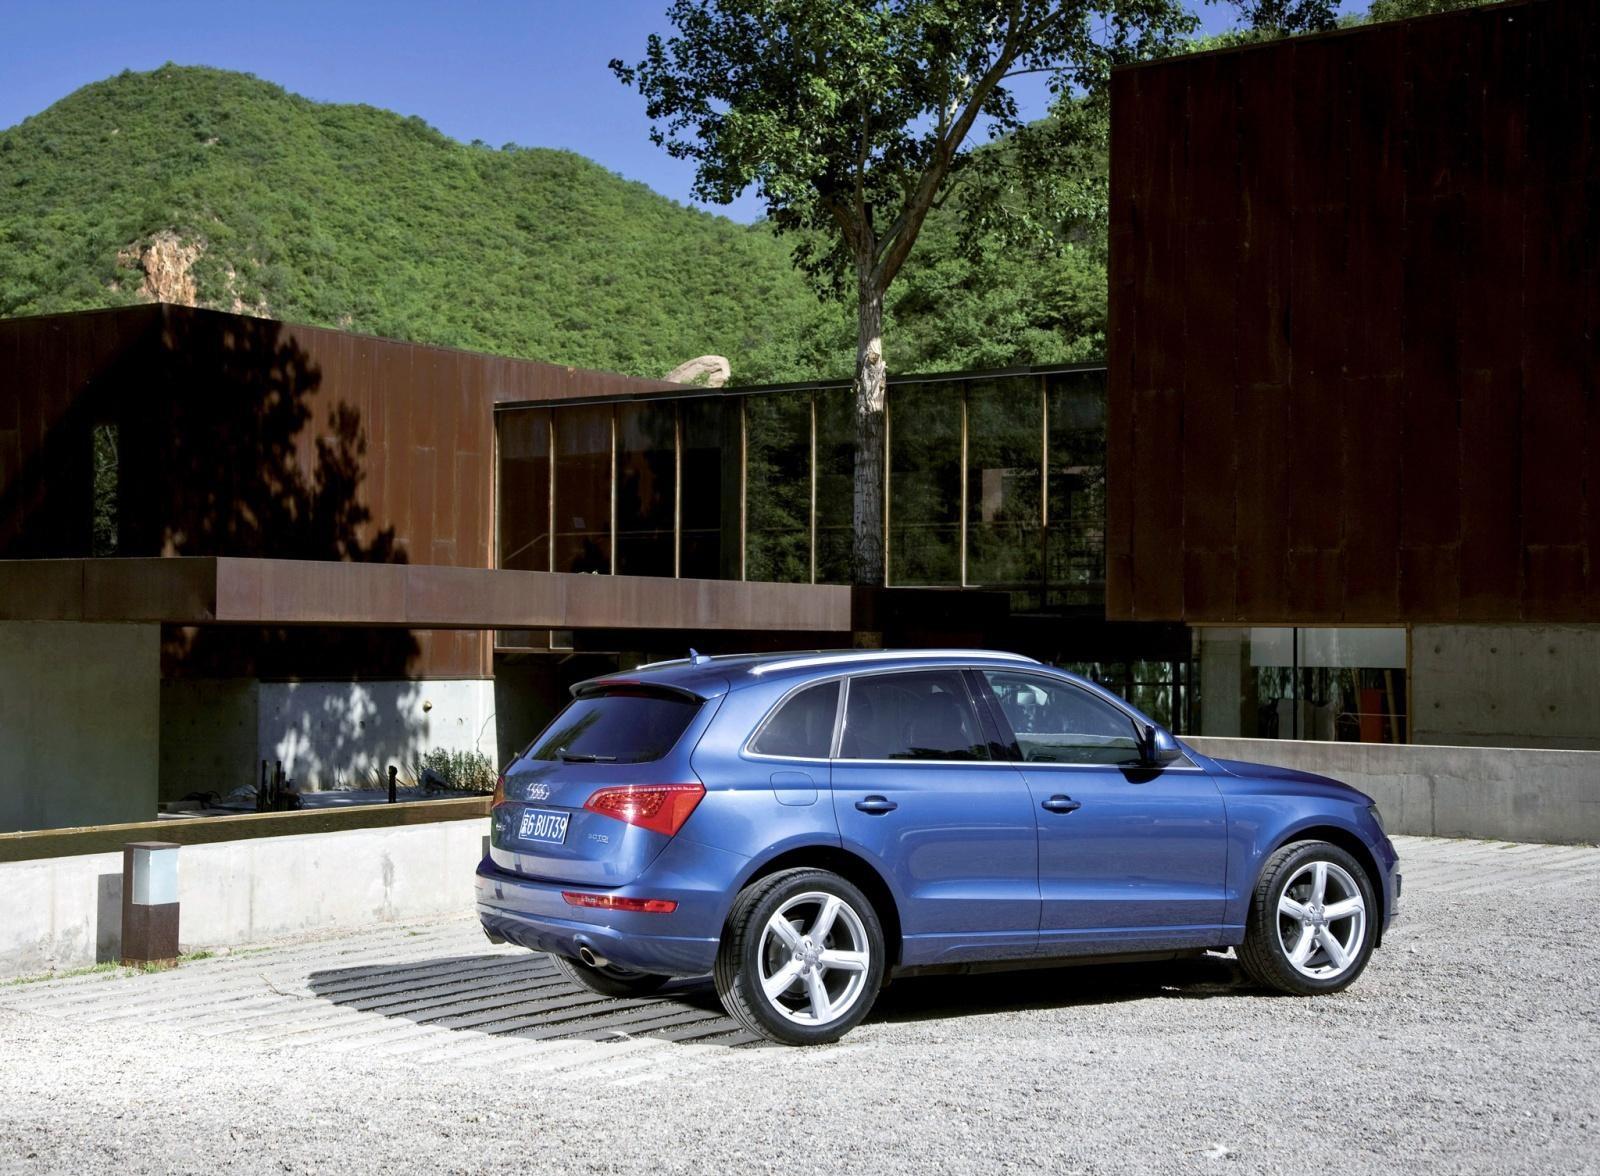 Audi Q5 30 Tdi Quattro Car 17 Wallpaper 1600x1176 Fondo